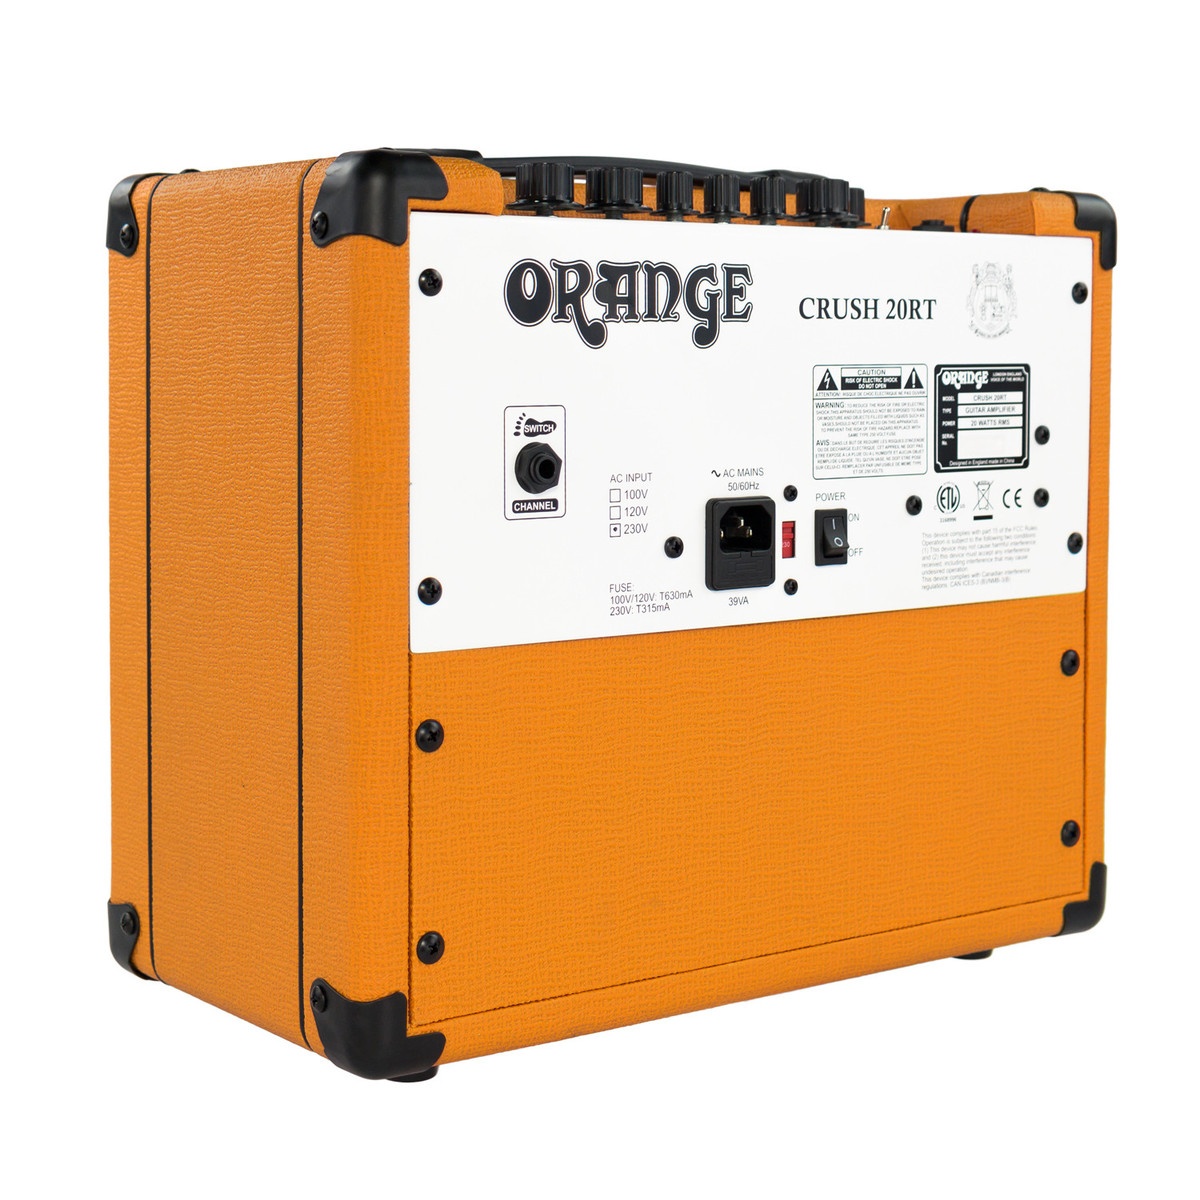 Orange Crush 20rt Guitar Combo Amp Box Opened At Gear4music Electroharmonix Soul Preacher Circuit Schematic Design Loading Zoom